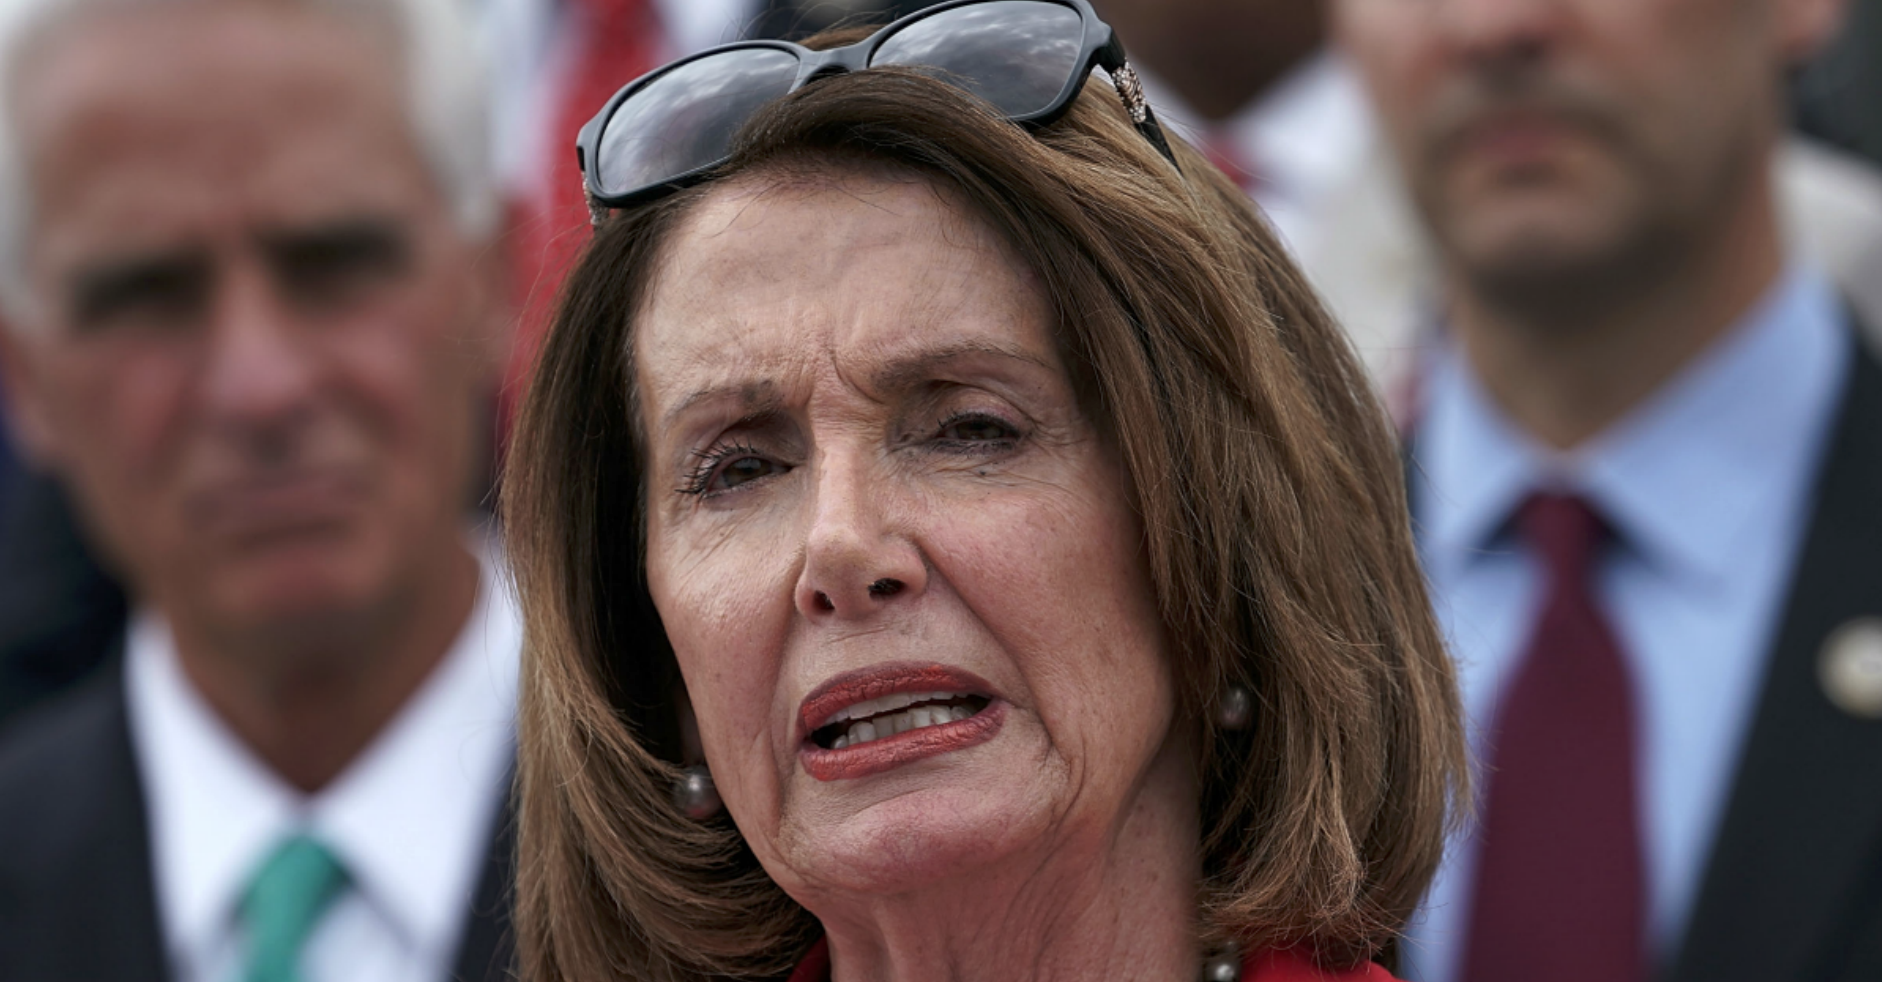 Image result for Nancy Pelosi old